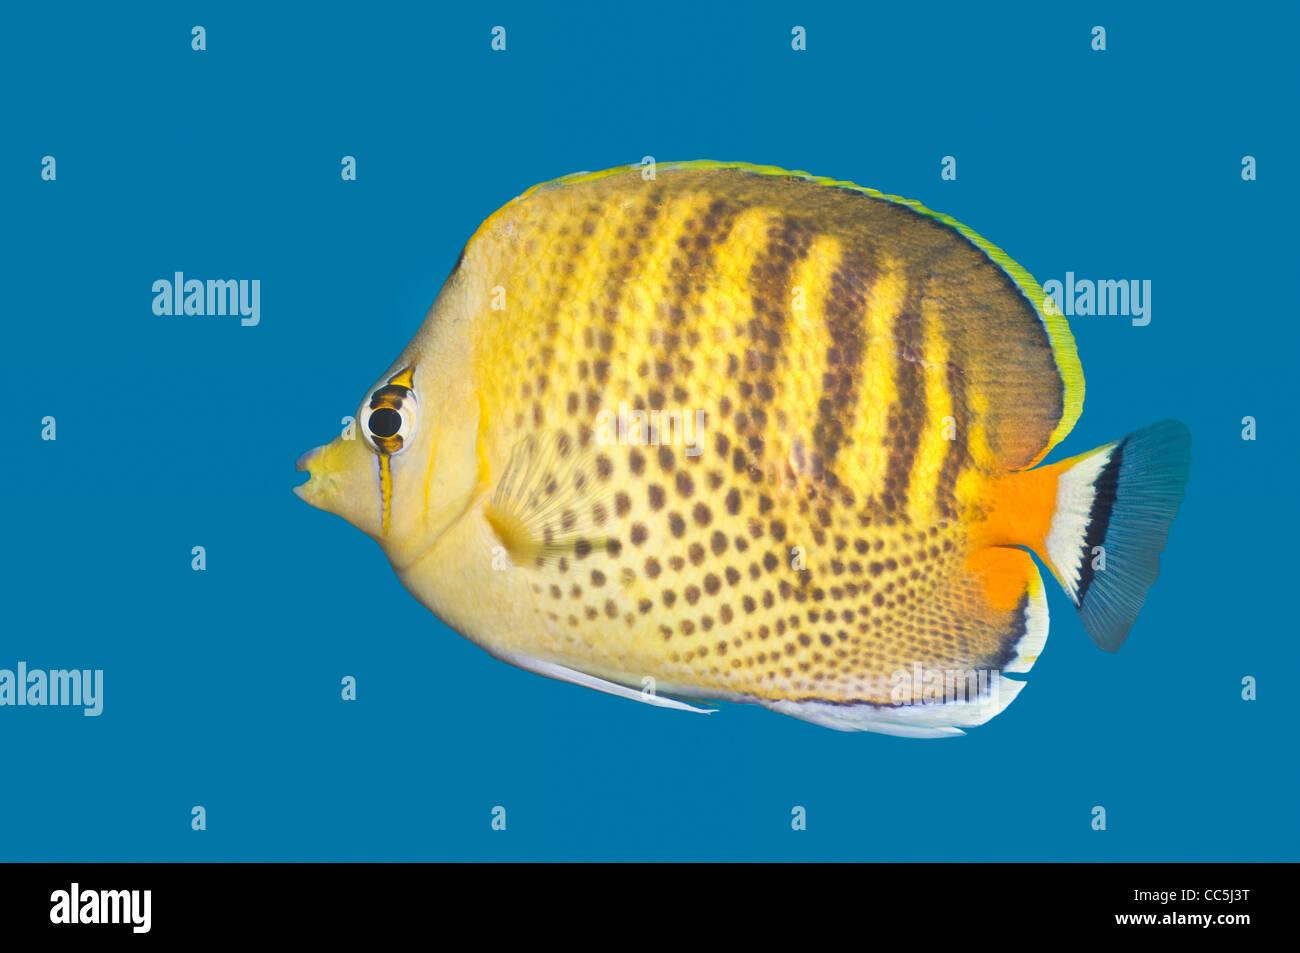 Spot-banded butterflyfish (Chaetodon punctatofasciatus) Imagen De Stock